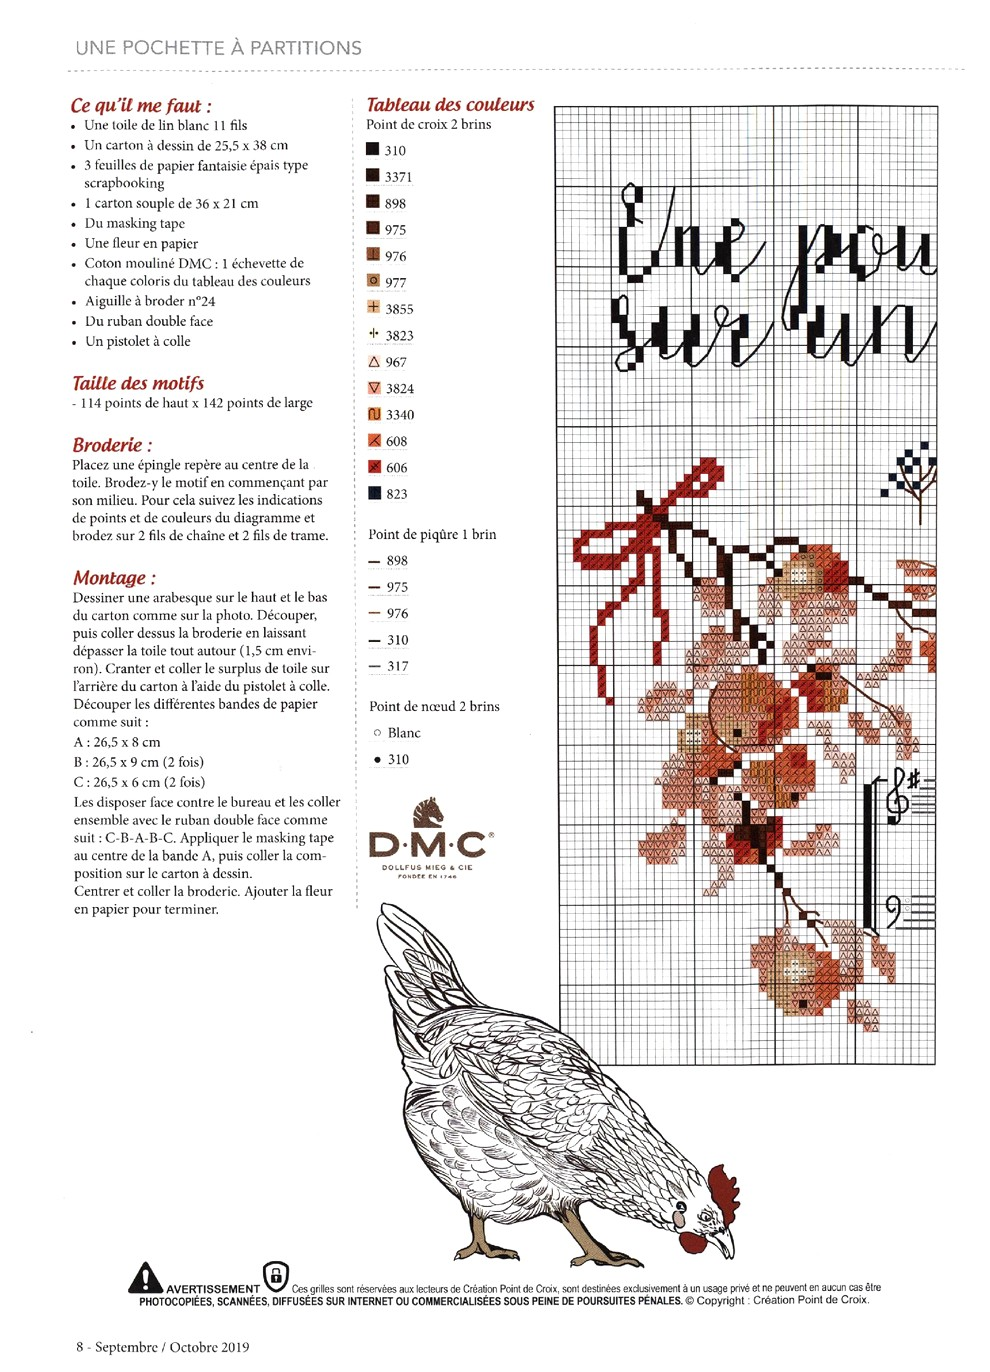 Журнал со схемами вышивки - Creation Point De Croix №78 2019 (8)